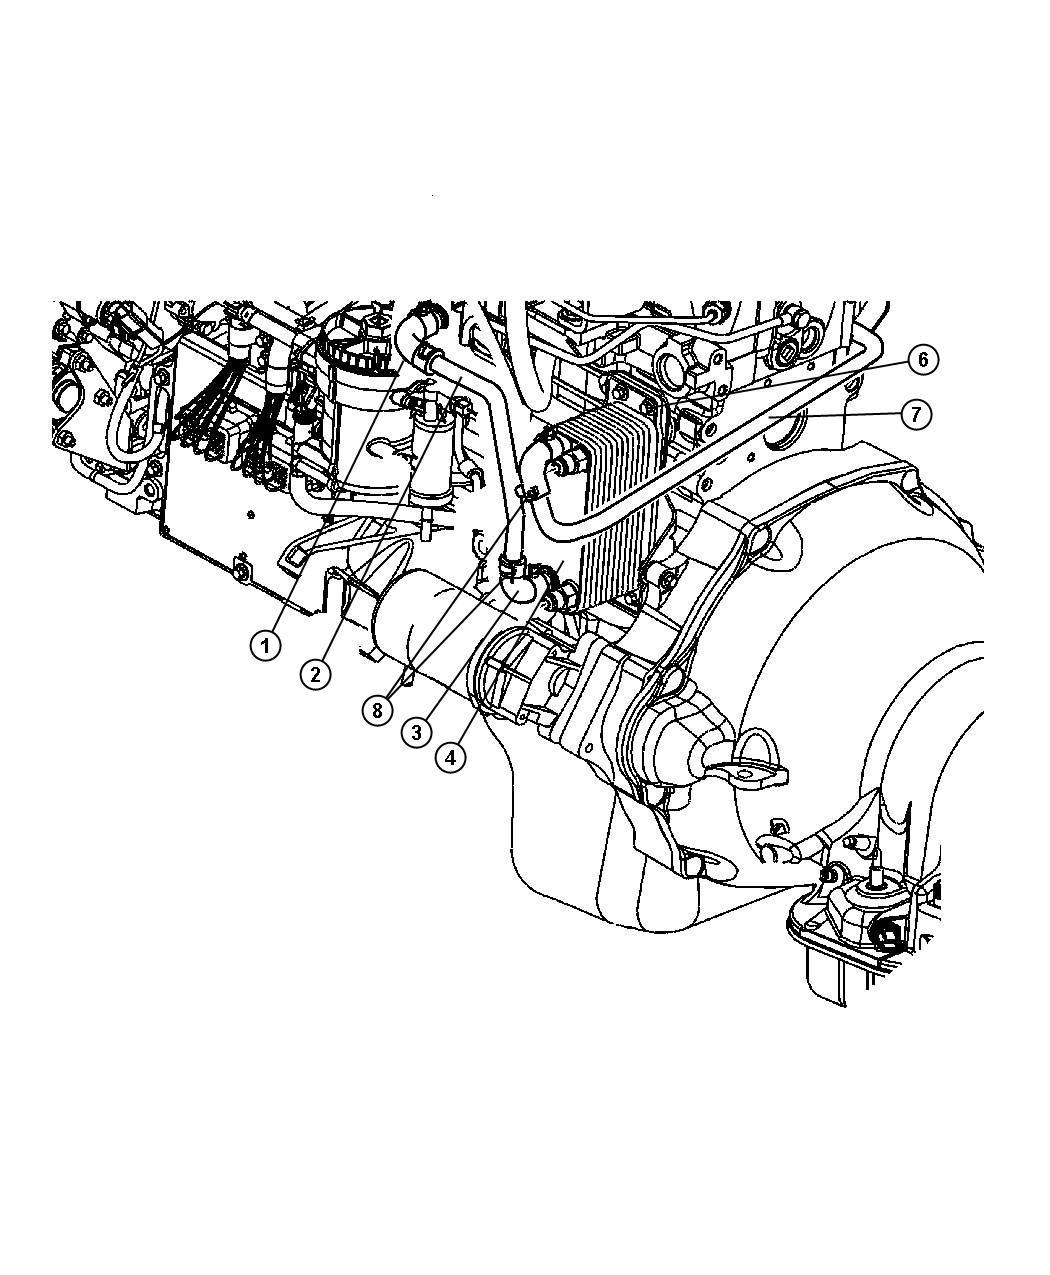 Wiring Diagram For 1030 Case Ck Diesel Auto Electrical Dieseltachwiring Tach Http Wwwcolemanequipcom 530 Tractor